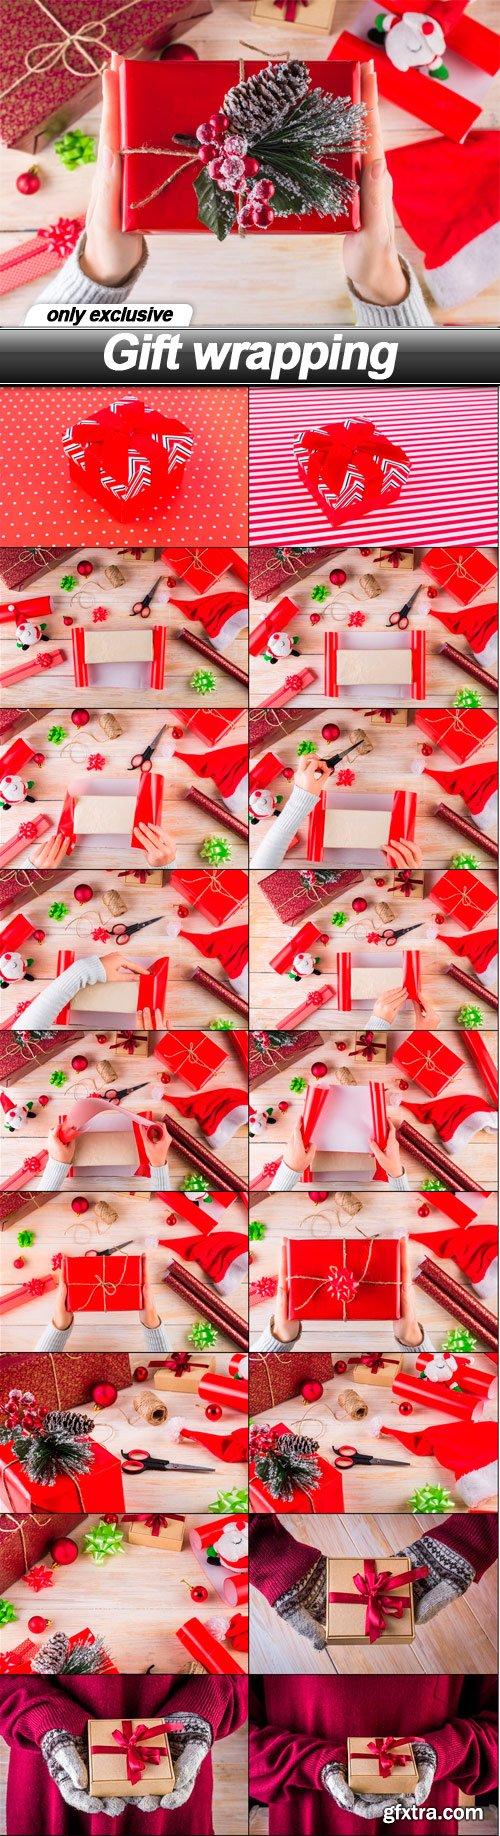 Gift wrapping - 19 UHQ JPEG